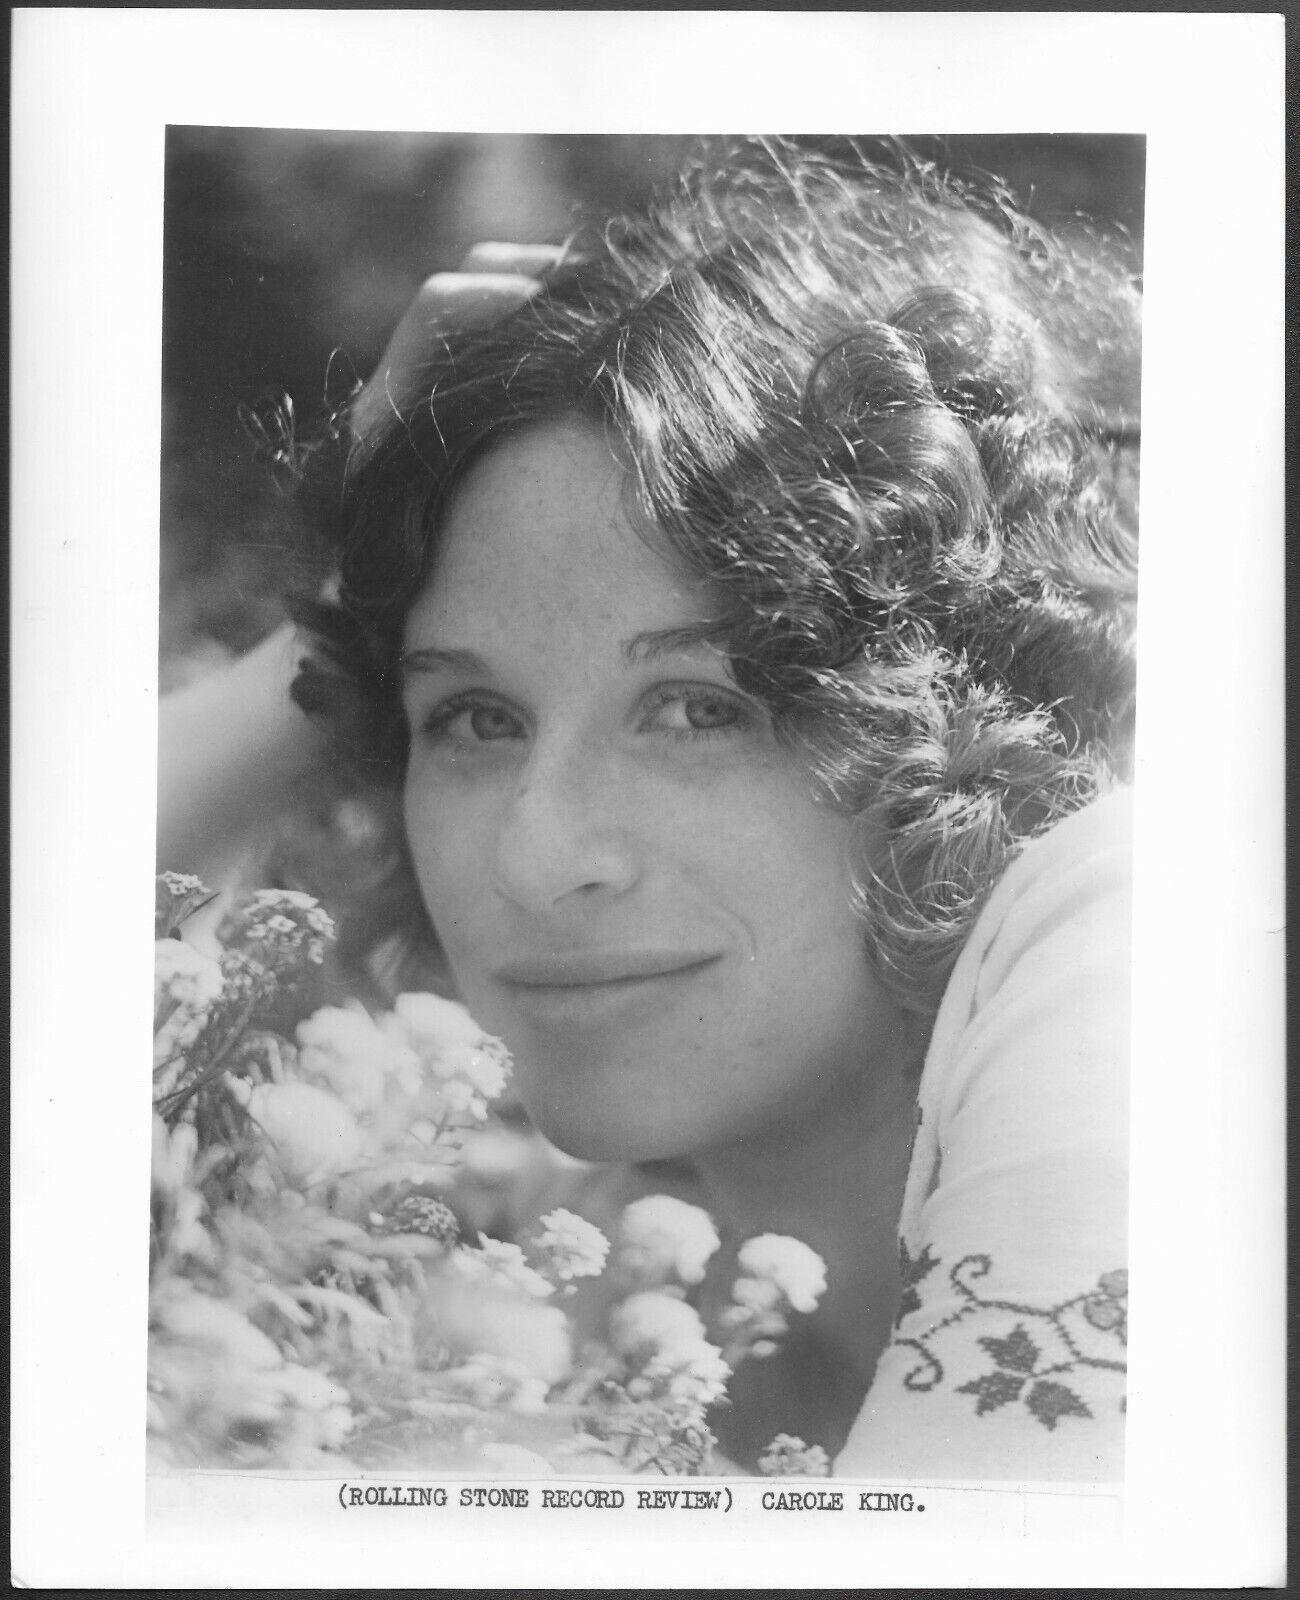 Carole King 1970s Original Rolling Stone Press Portrait Photo  - $14.95